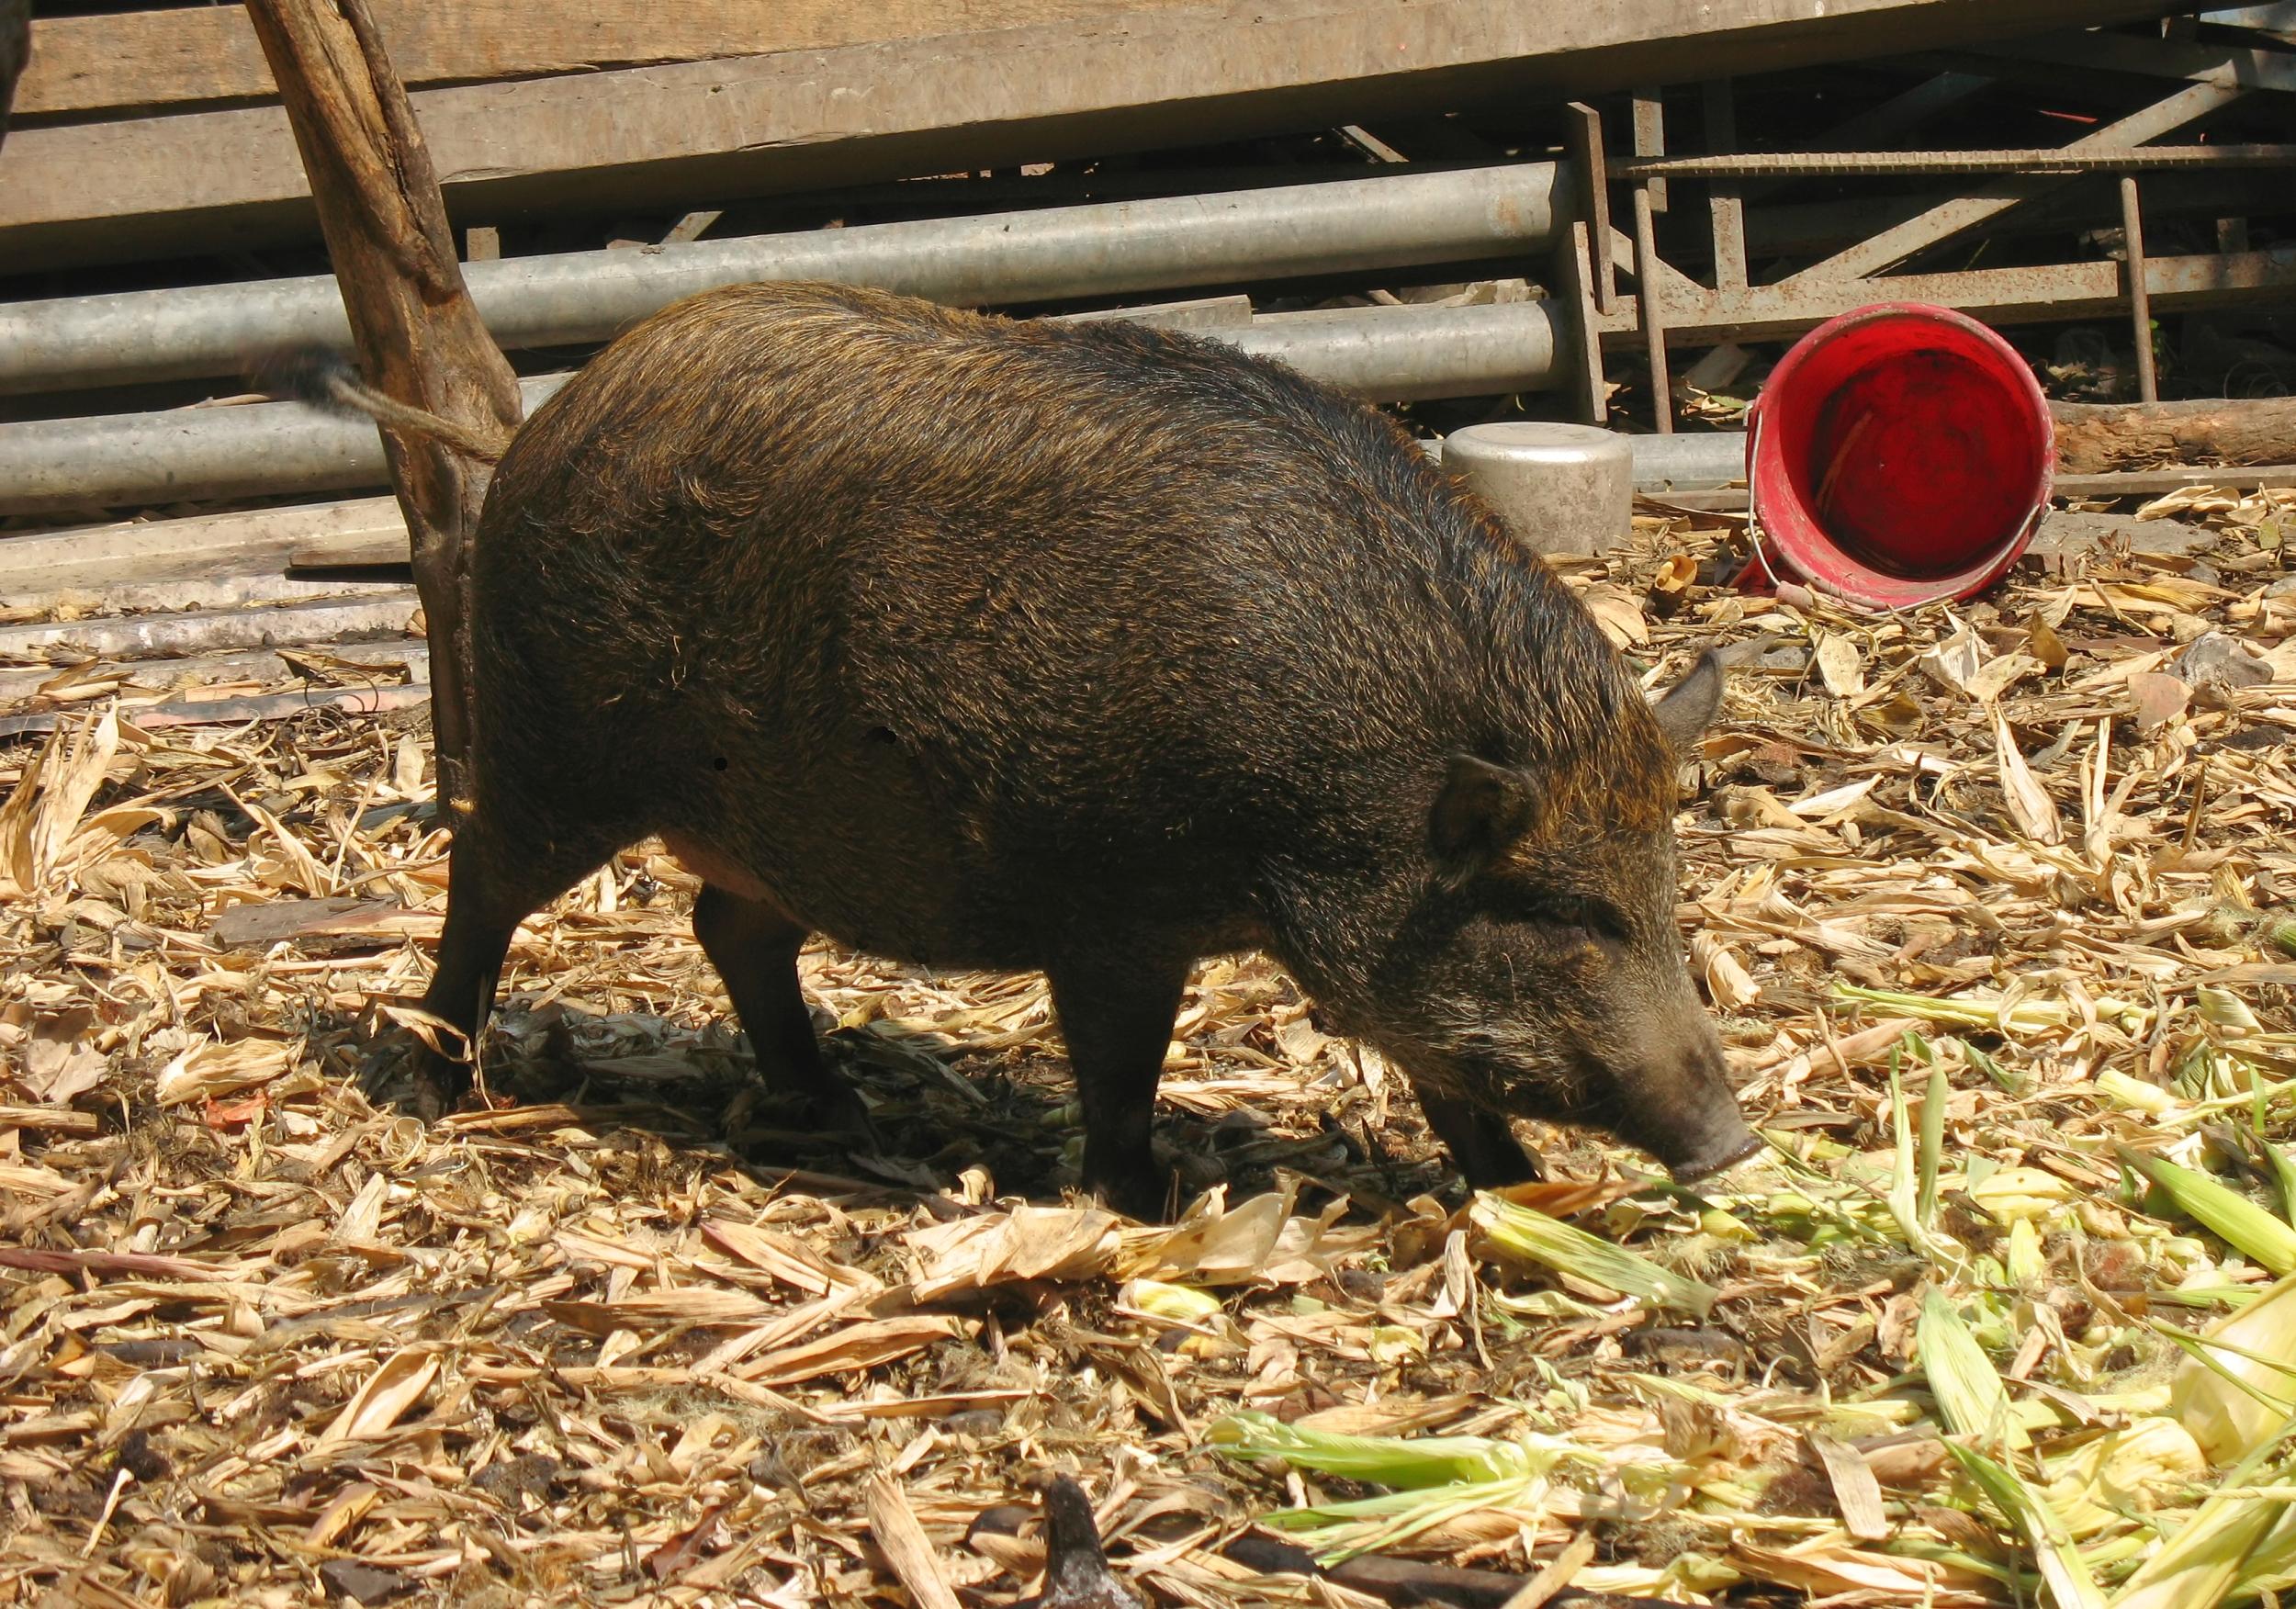 Chinese Black Pig, Animal, Tree, Tail, Swine, HQ Photo